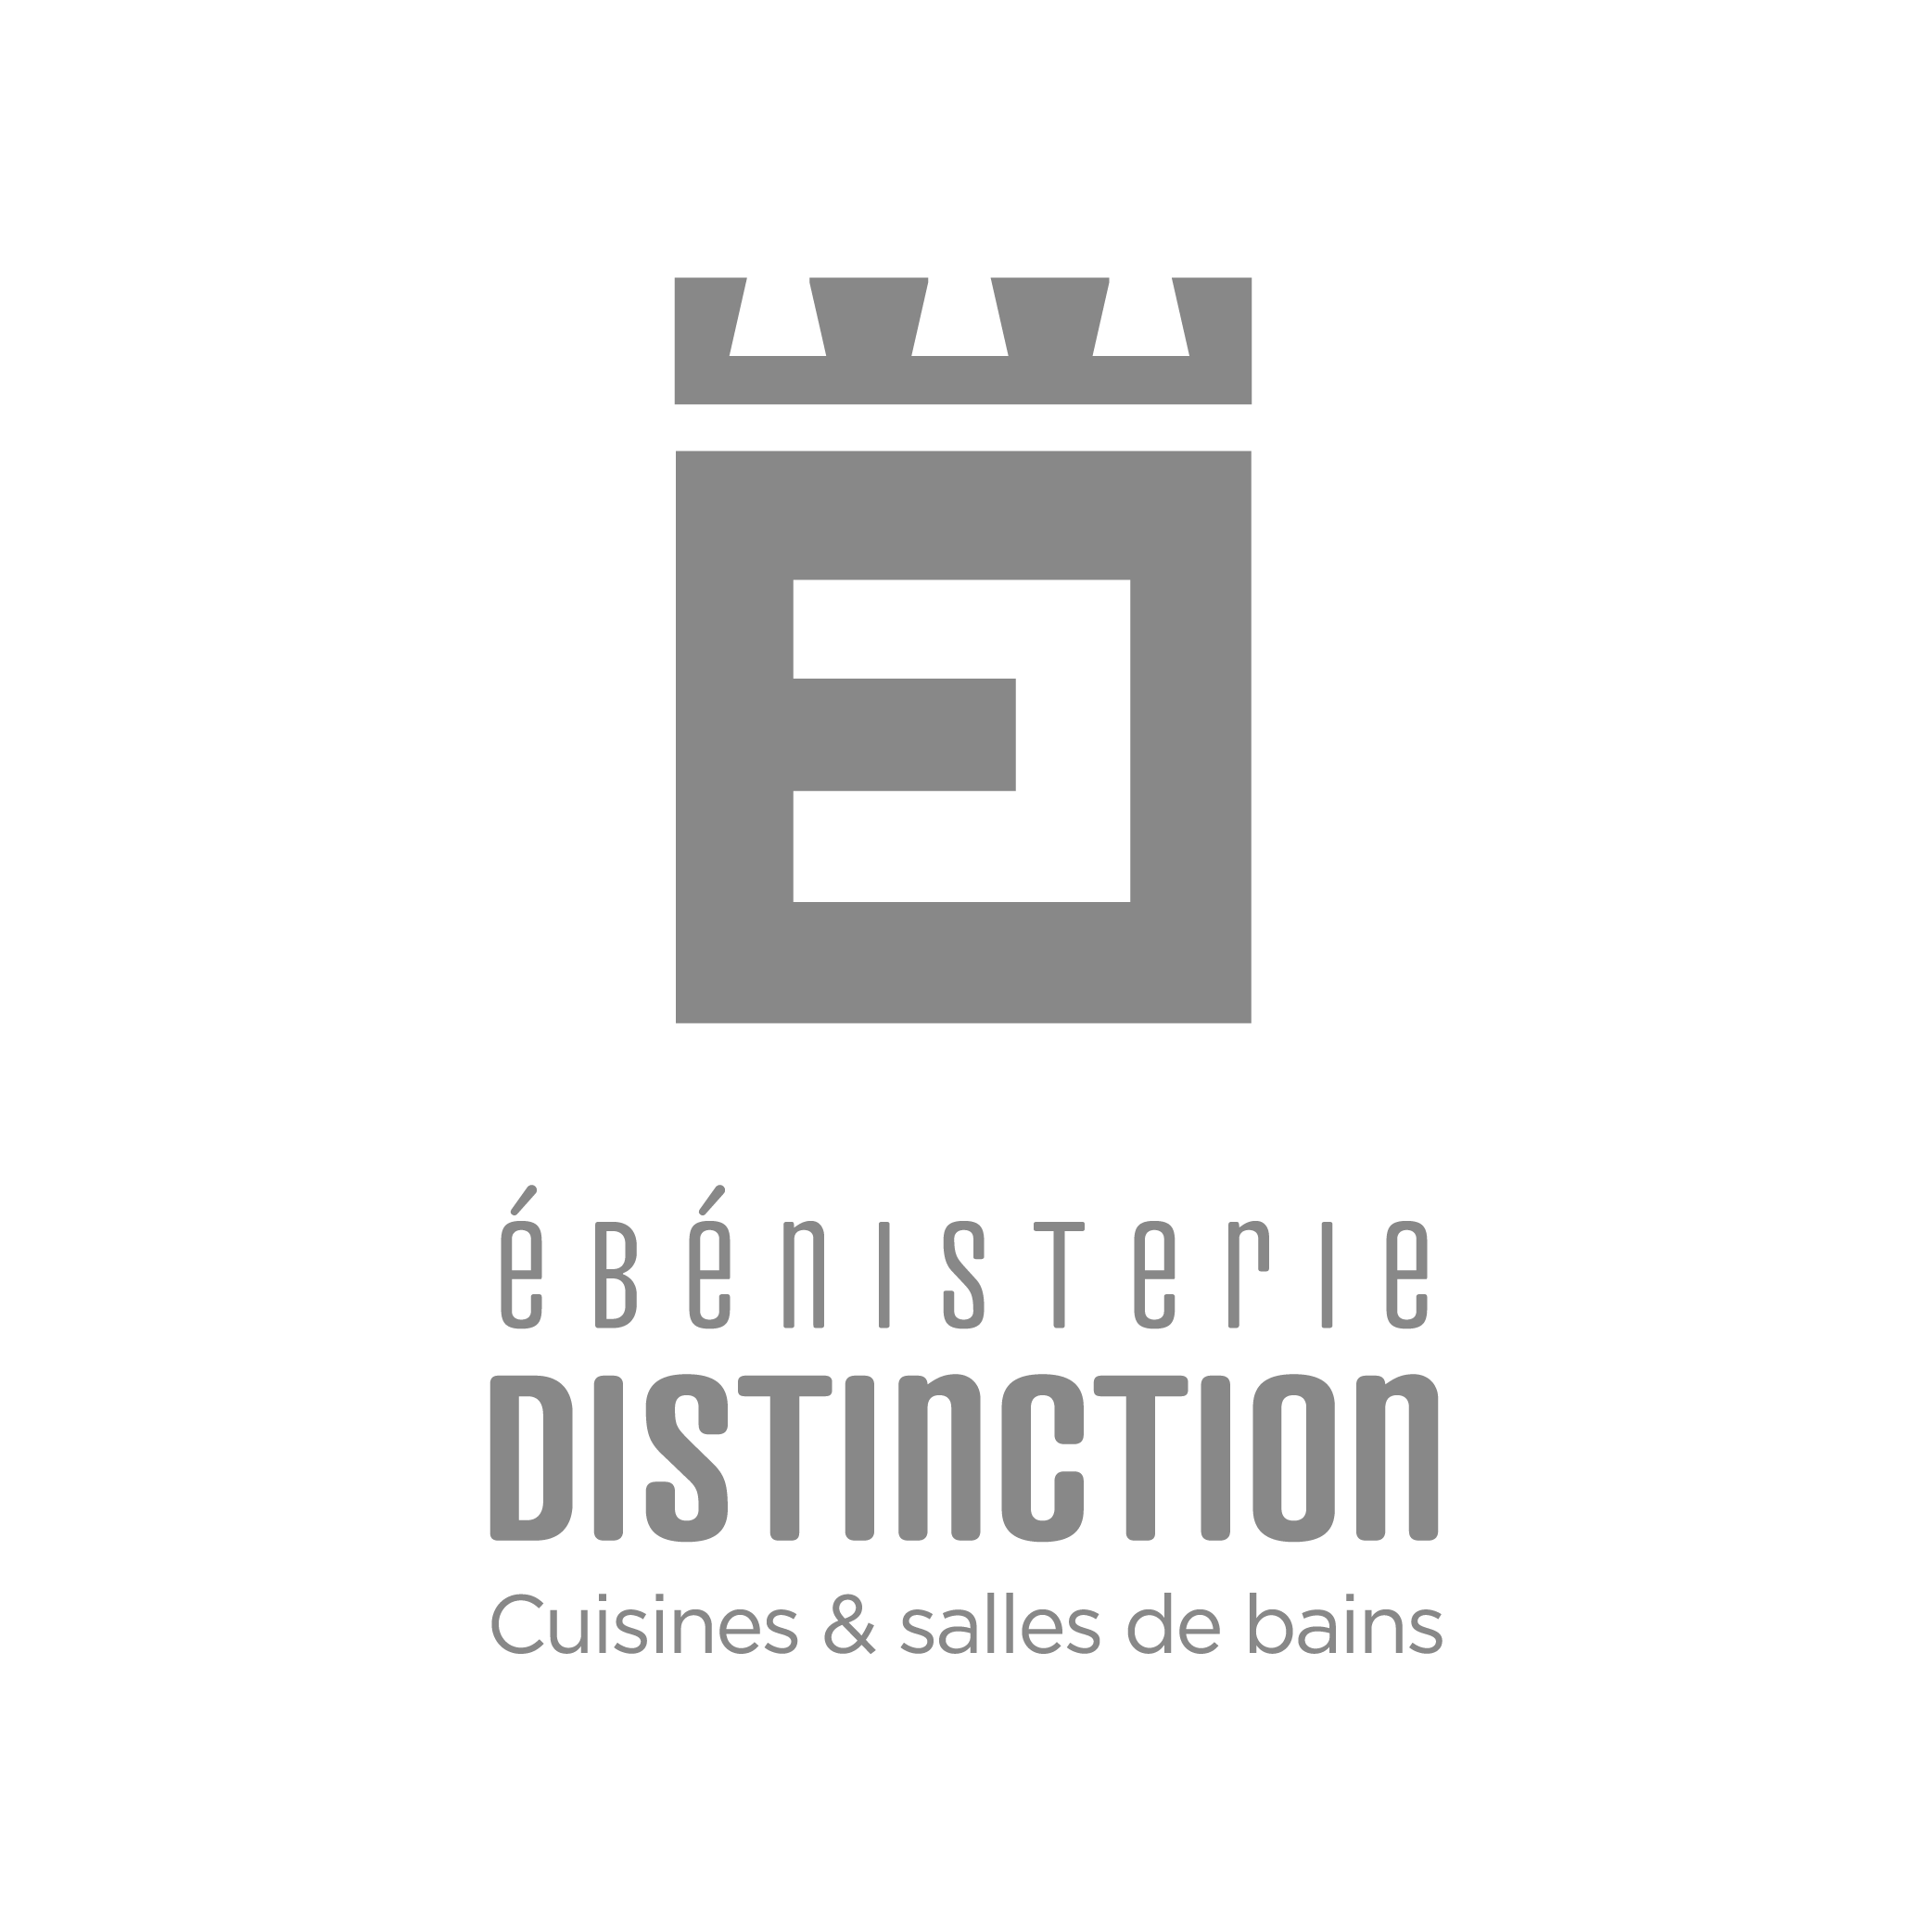 Ébénisterie Distinction